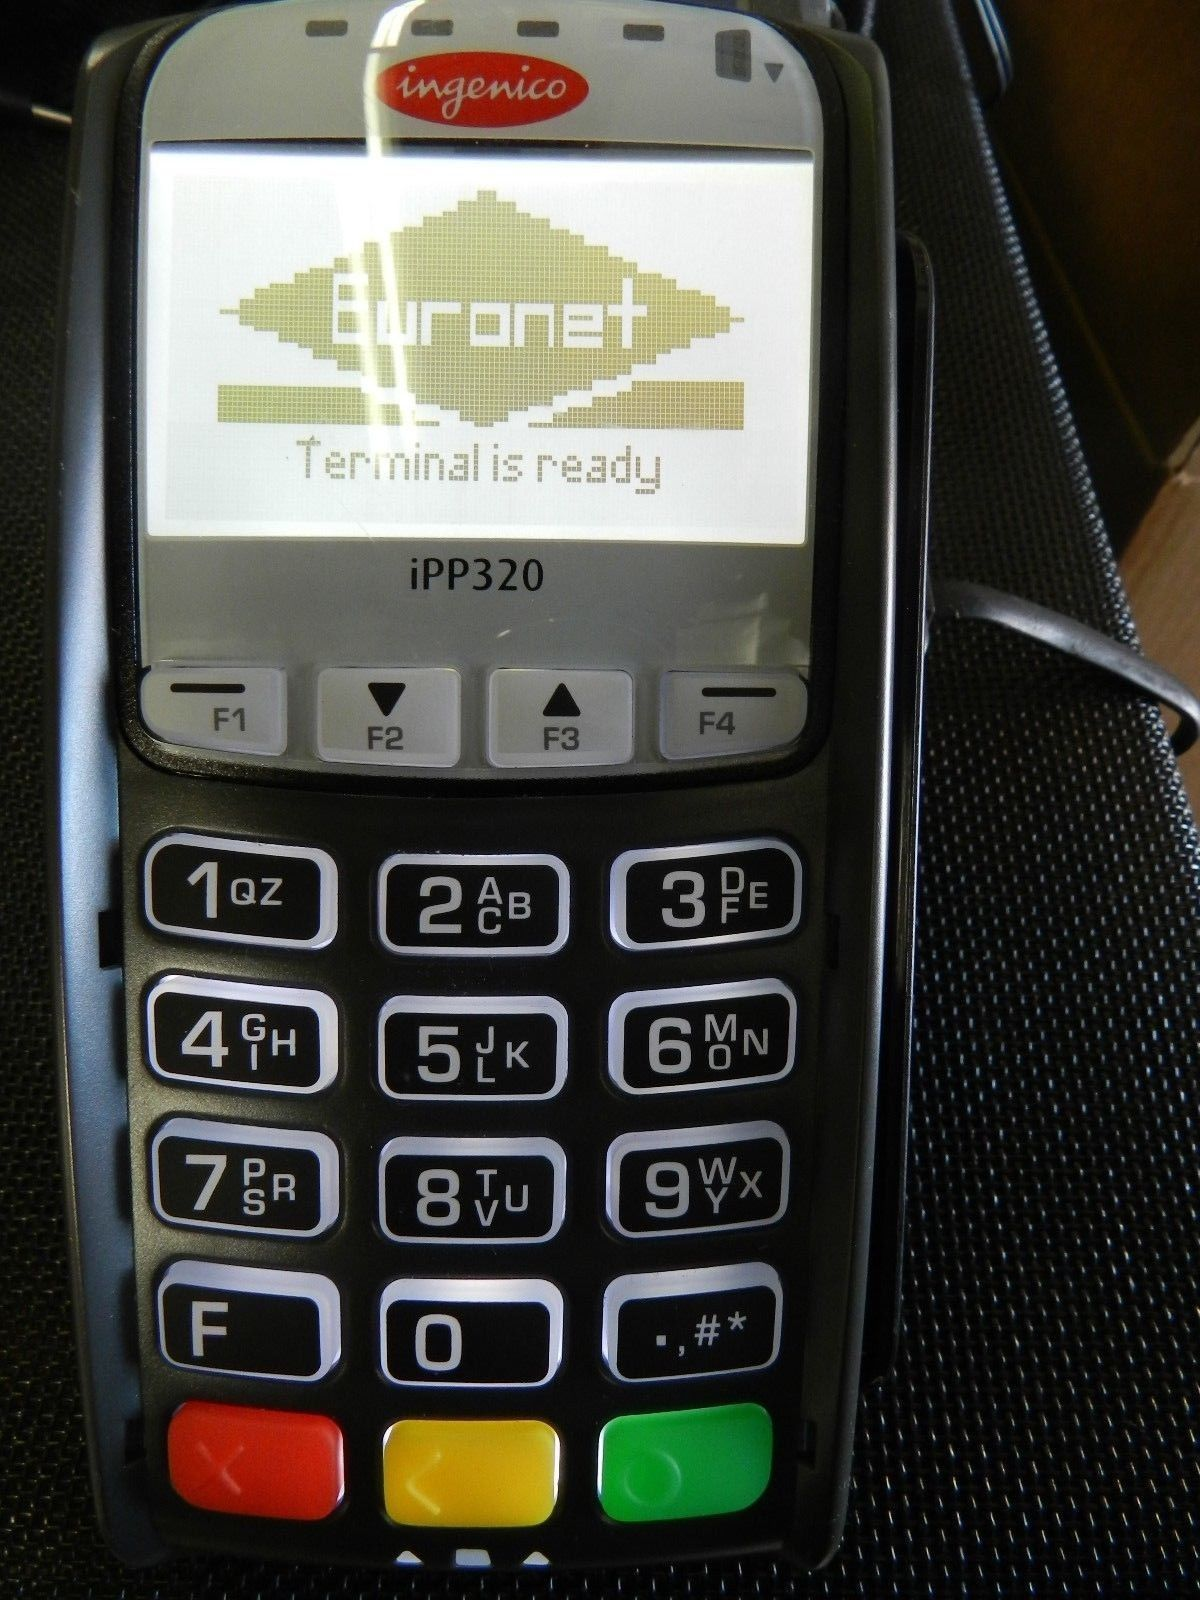 Ingenico Ipp320 EMV Pin Pad W/ Chip Reader POS | eBay